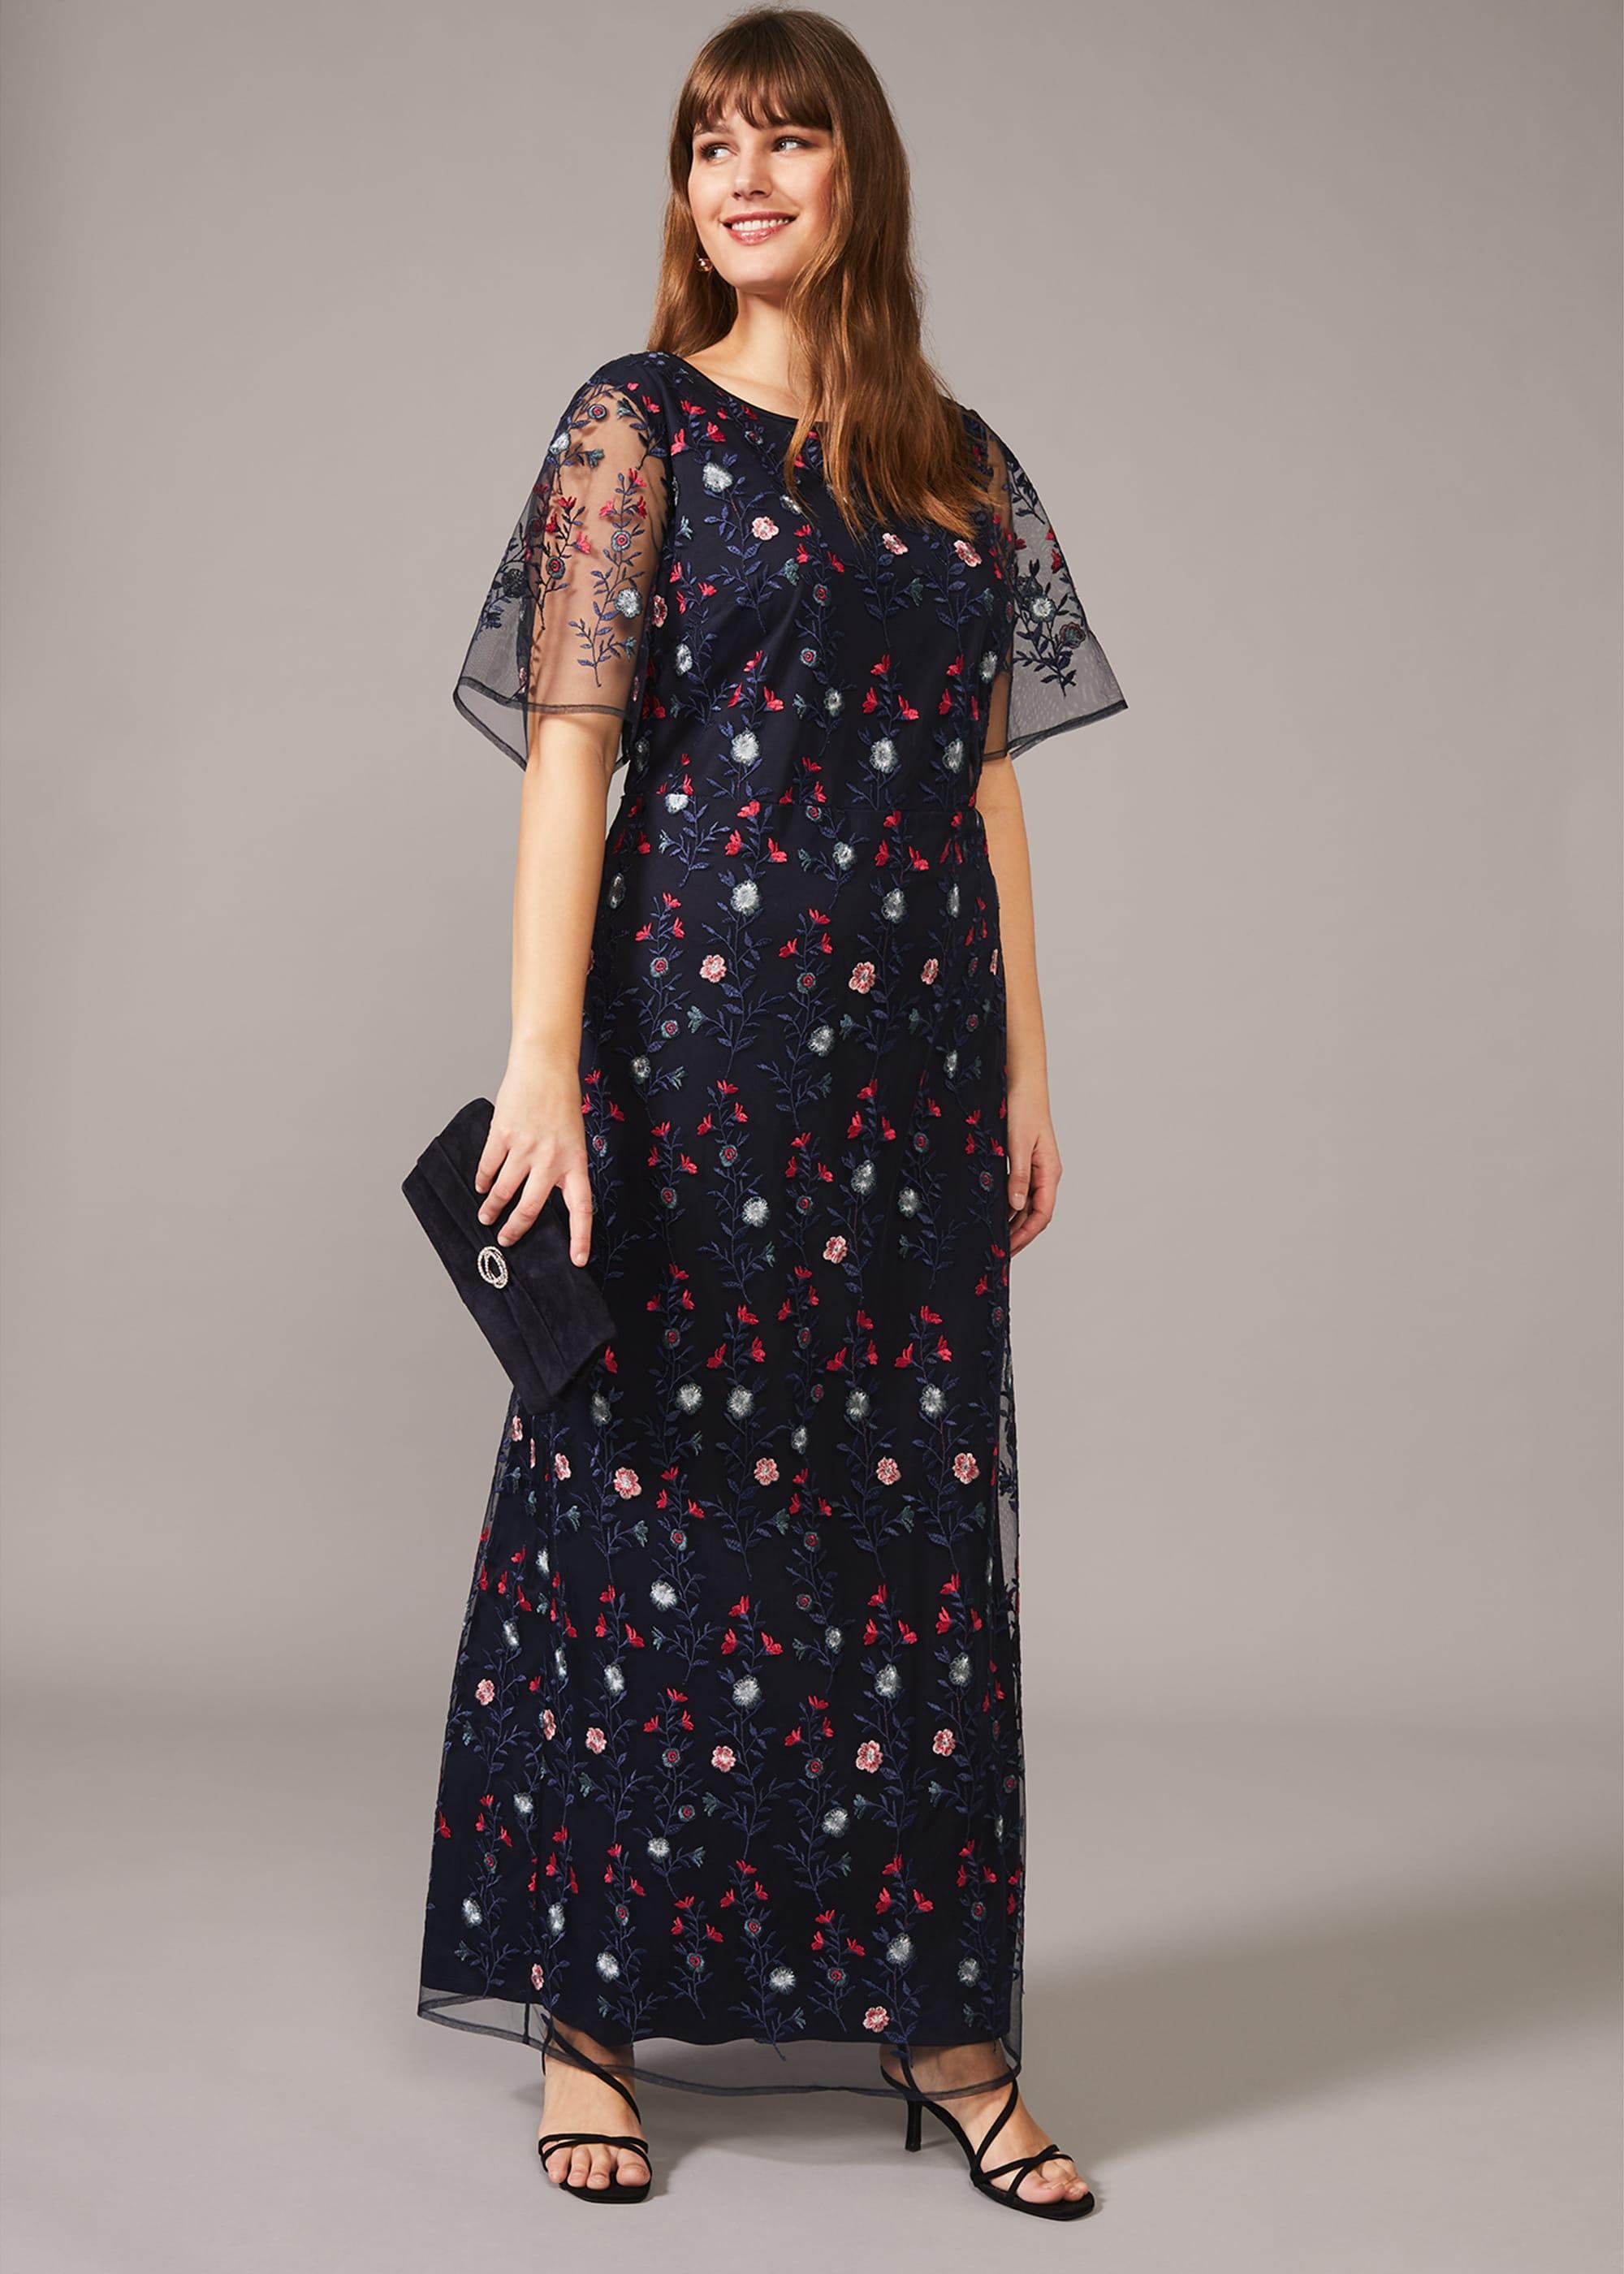 Studio 8 Women Emily Embroidered Maxi Dress